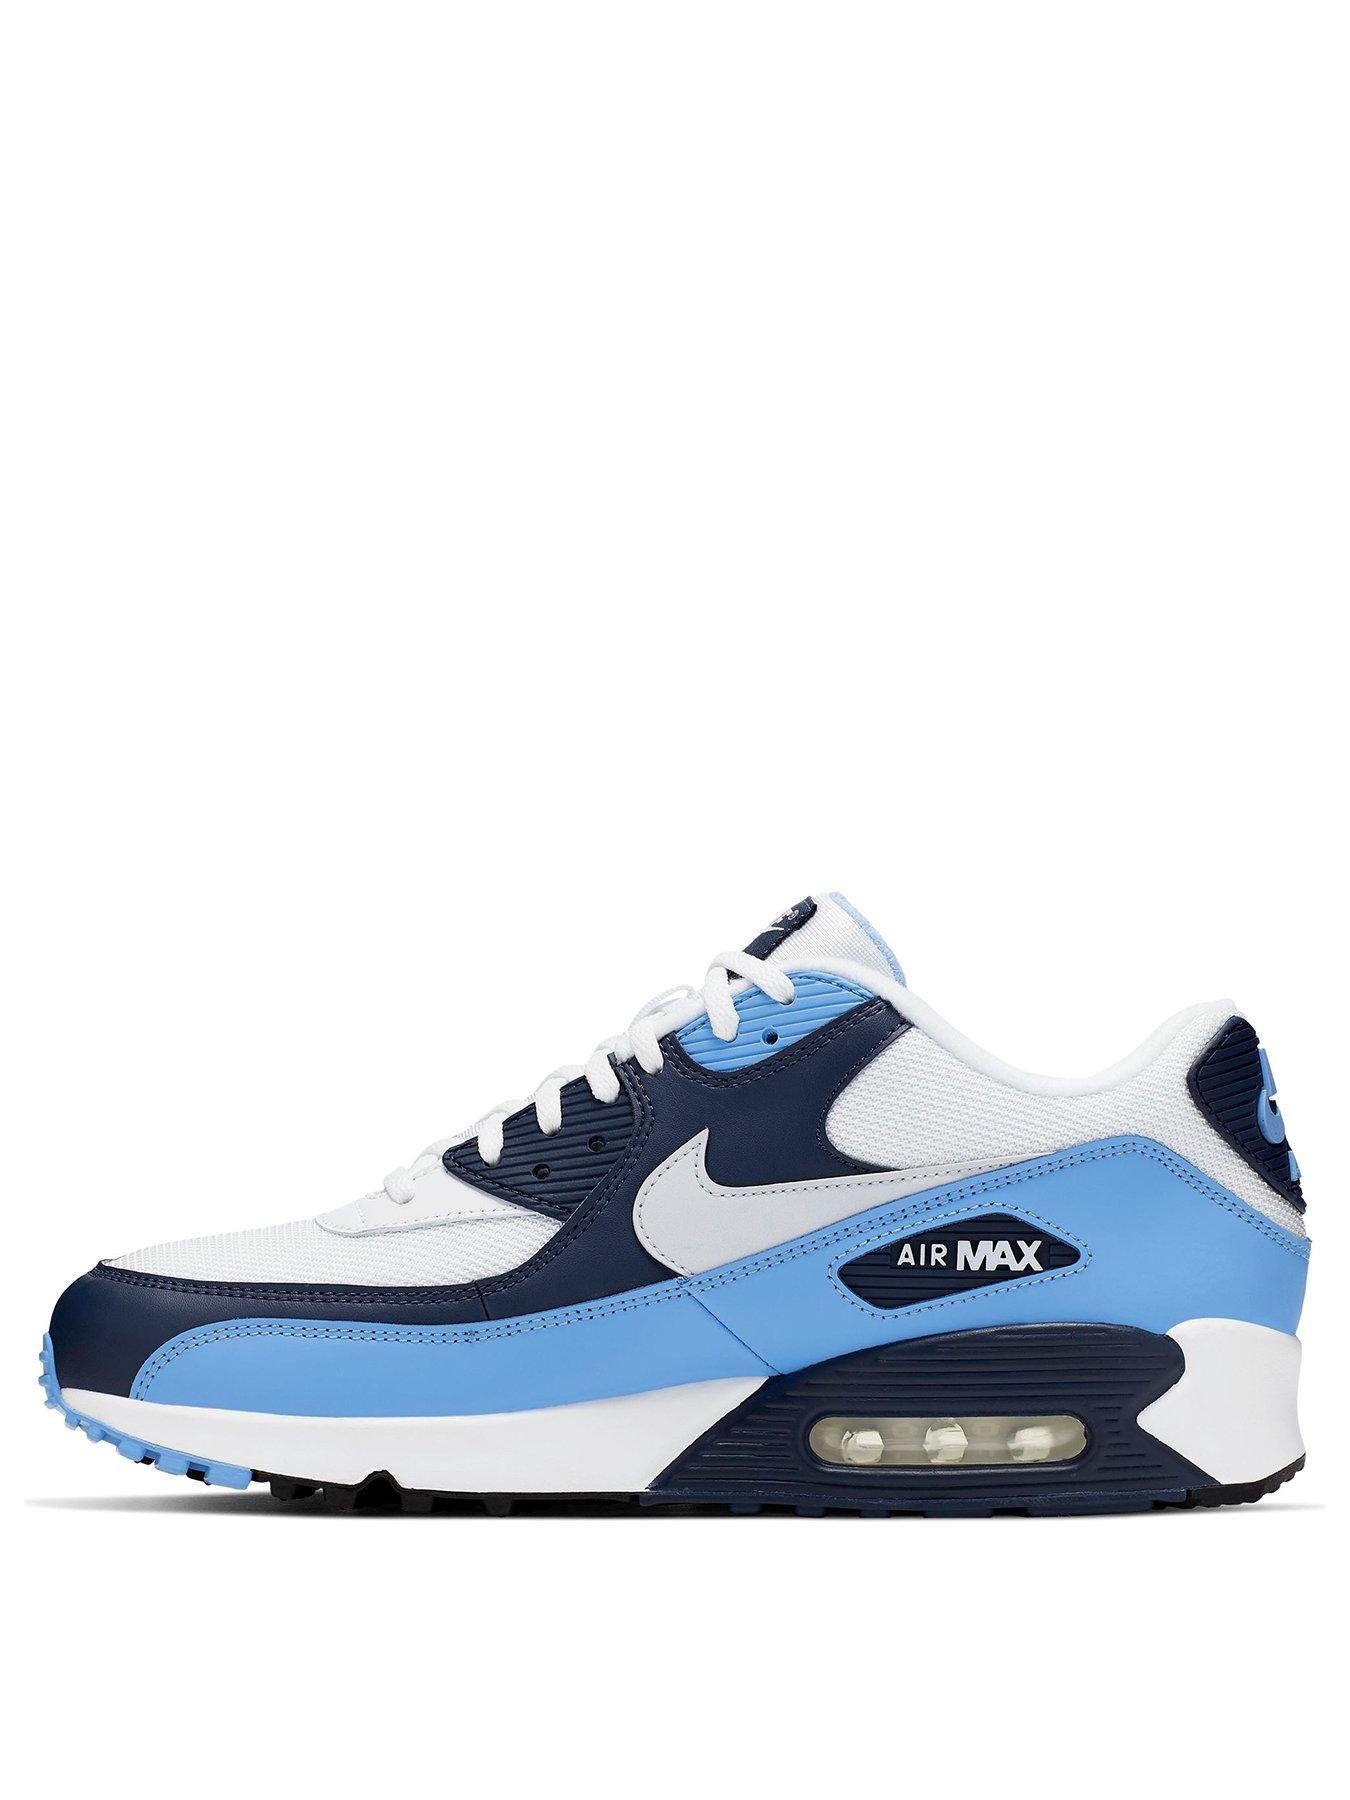 Nike Air Max 90 | Nike | Trainers | Men | very.co.uk